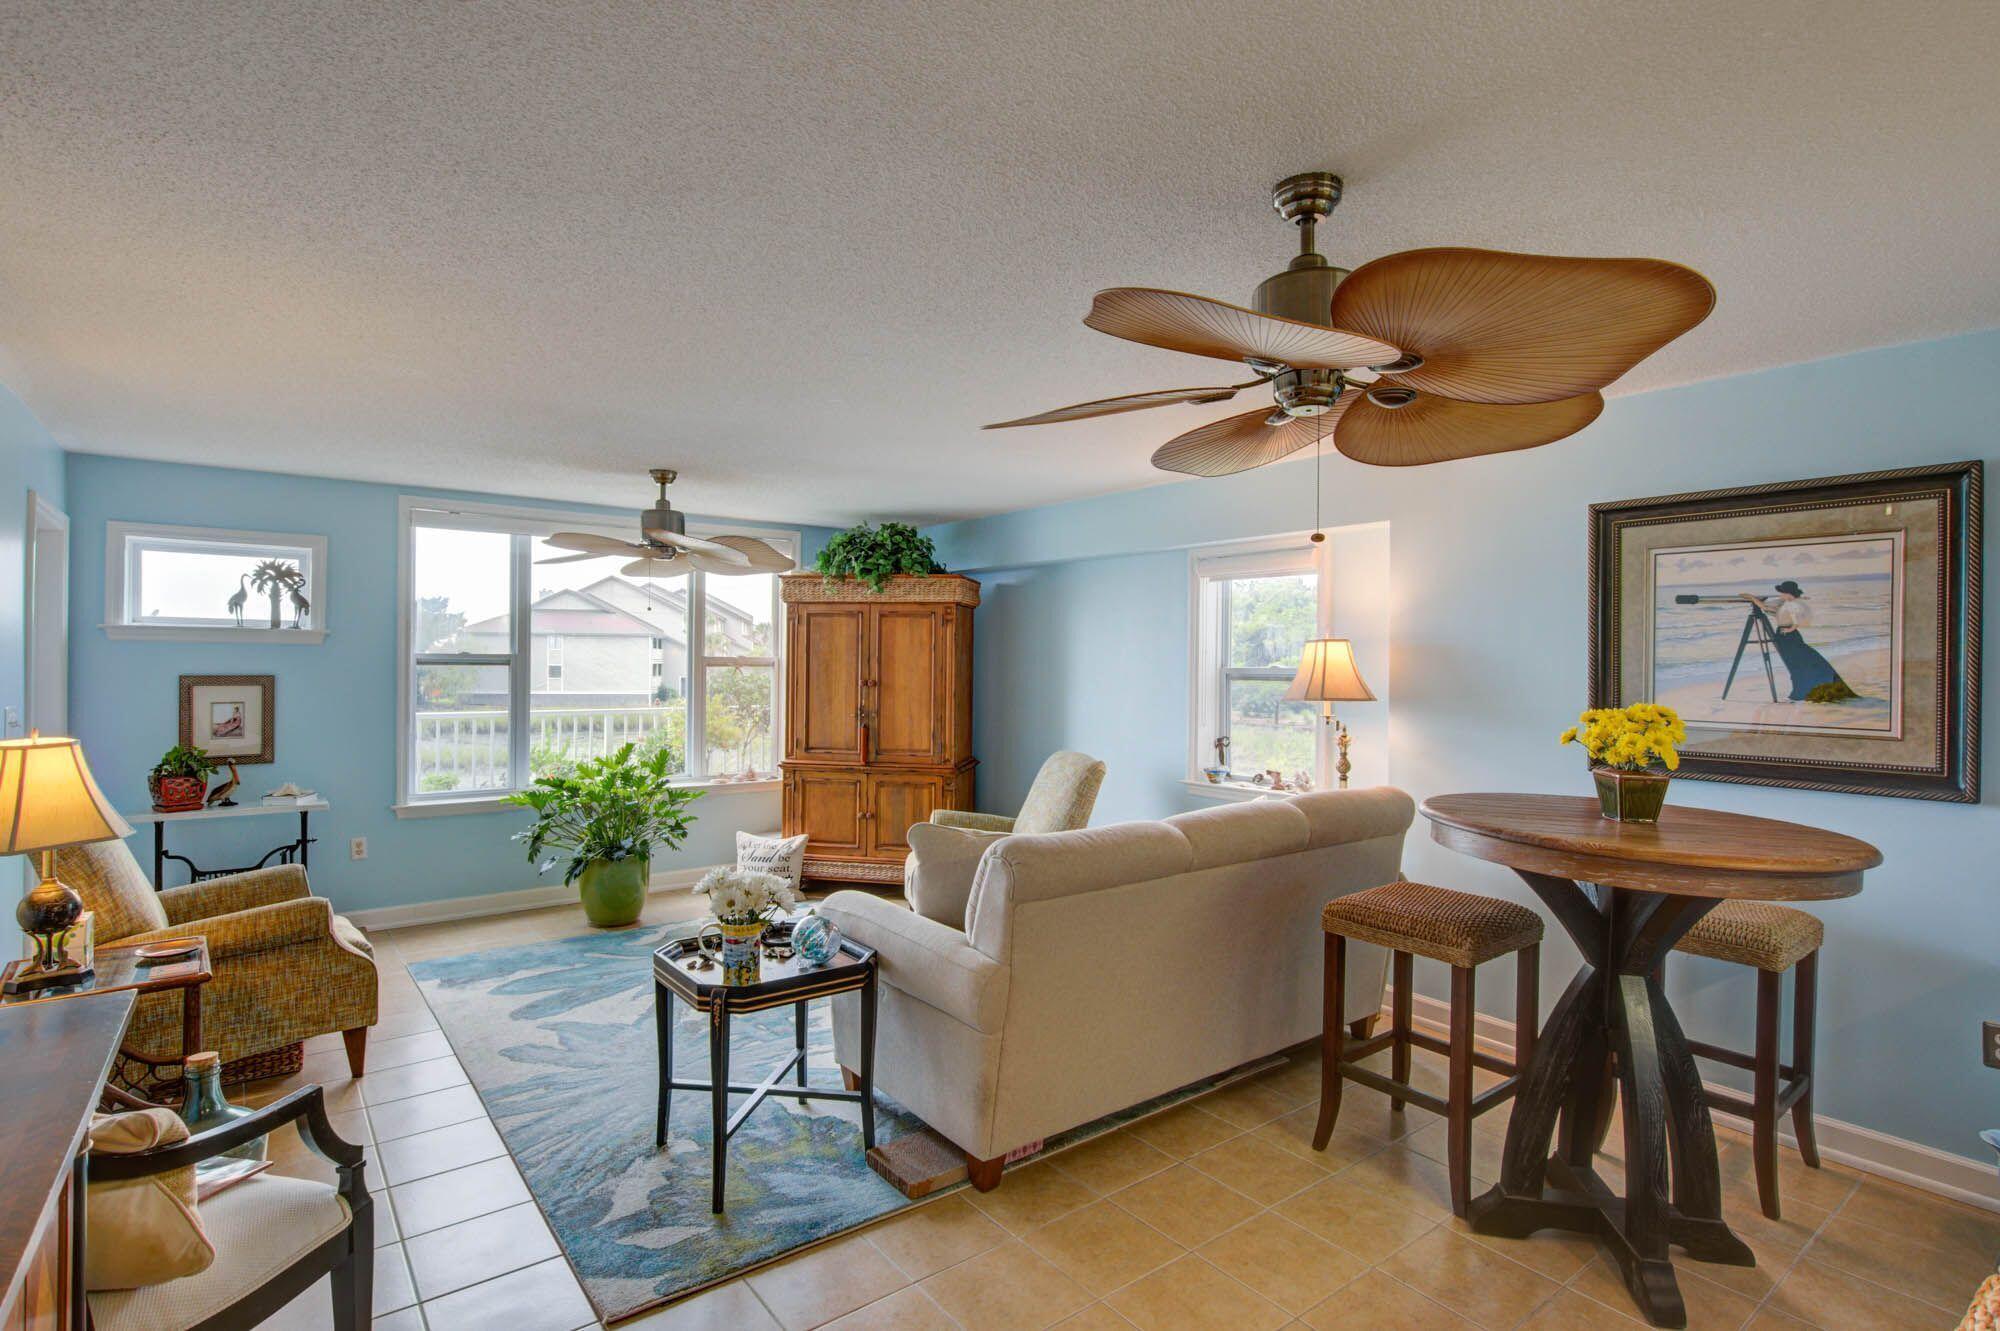 Turn of River Homes For Sale - 2395 Folly, Folly Beach, SC - 29